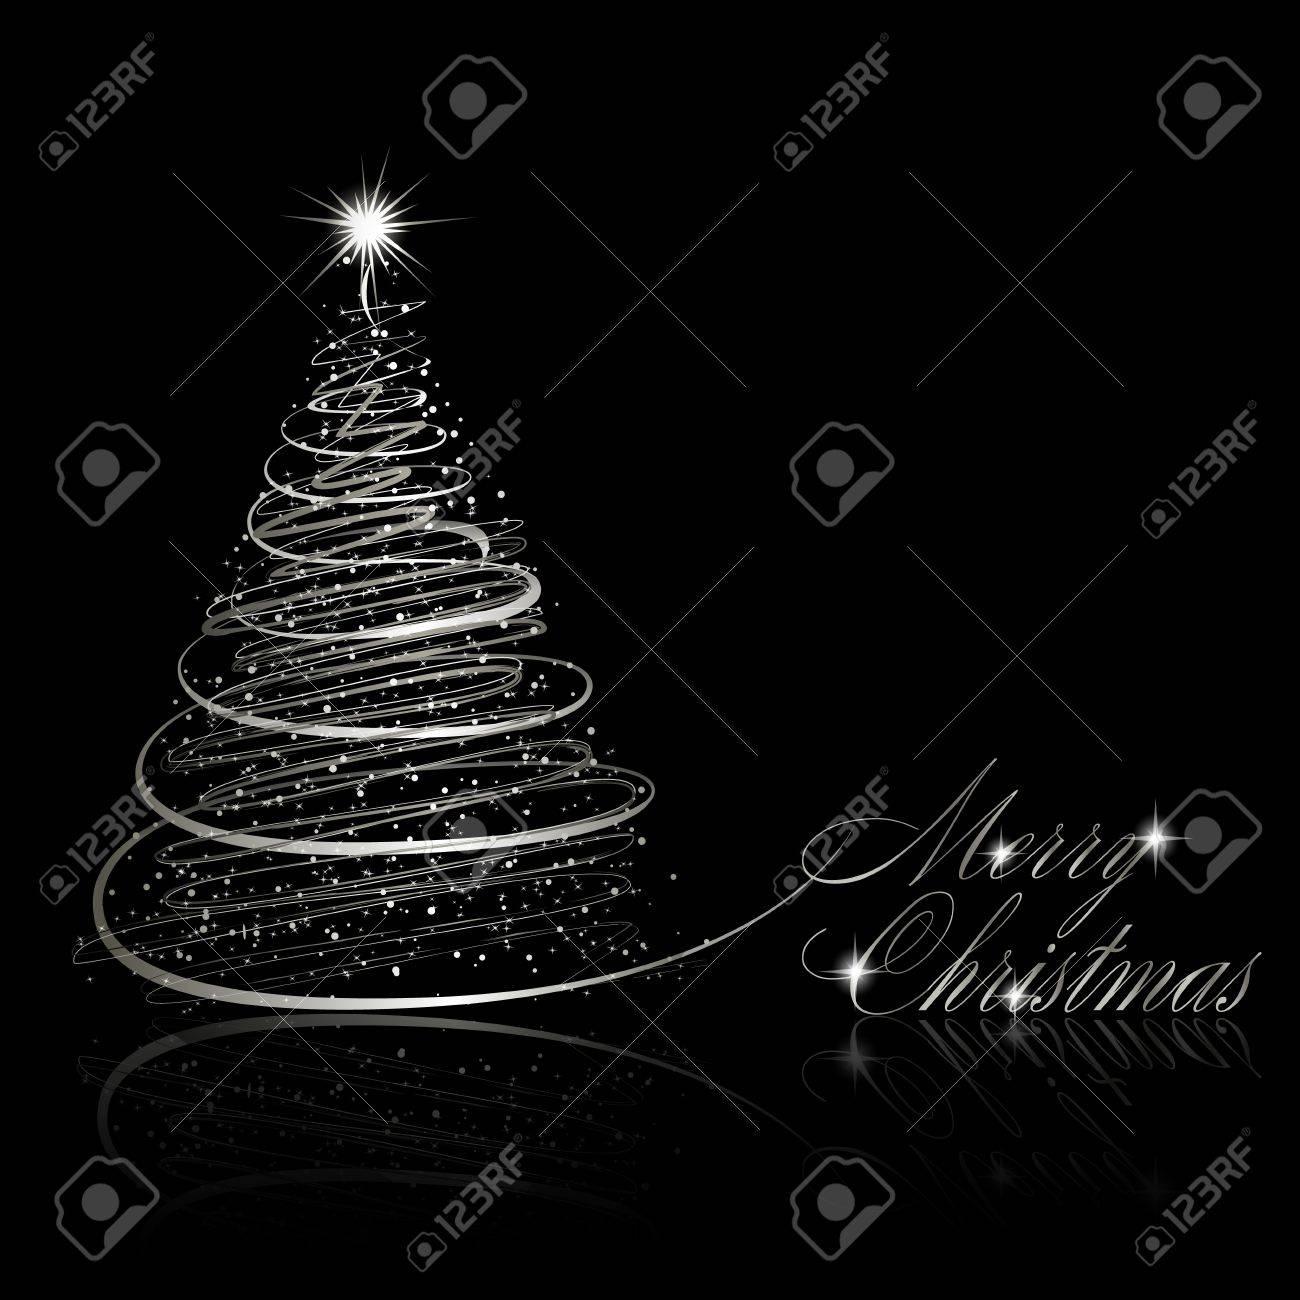 Silver Christmas tree on black background.  illustration Stock Vector - 11531534